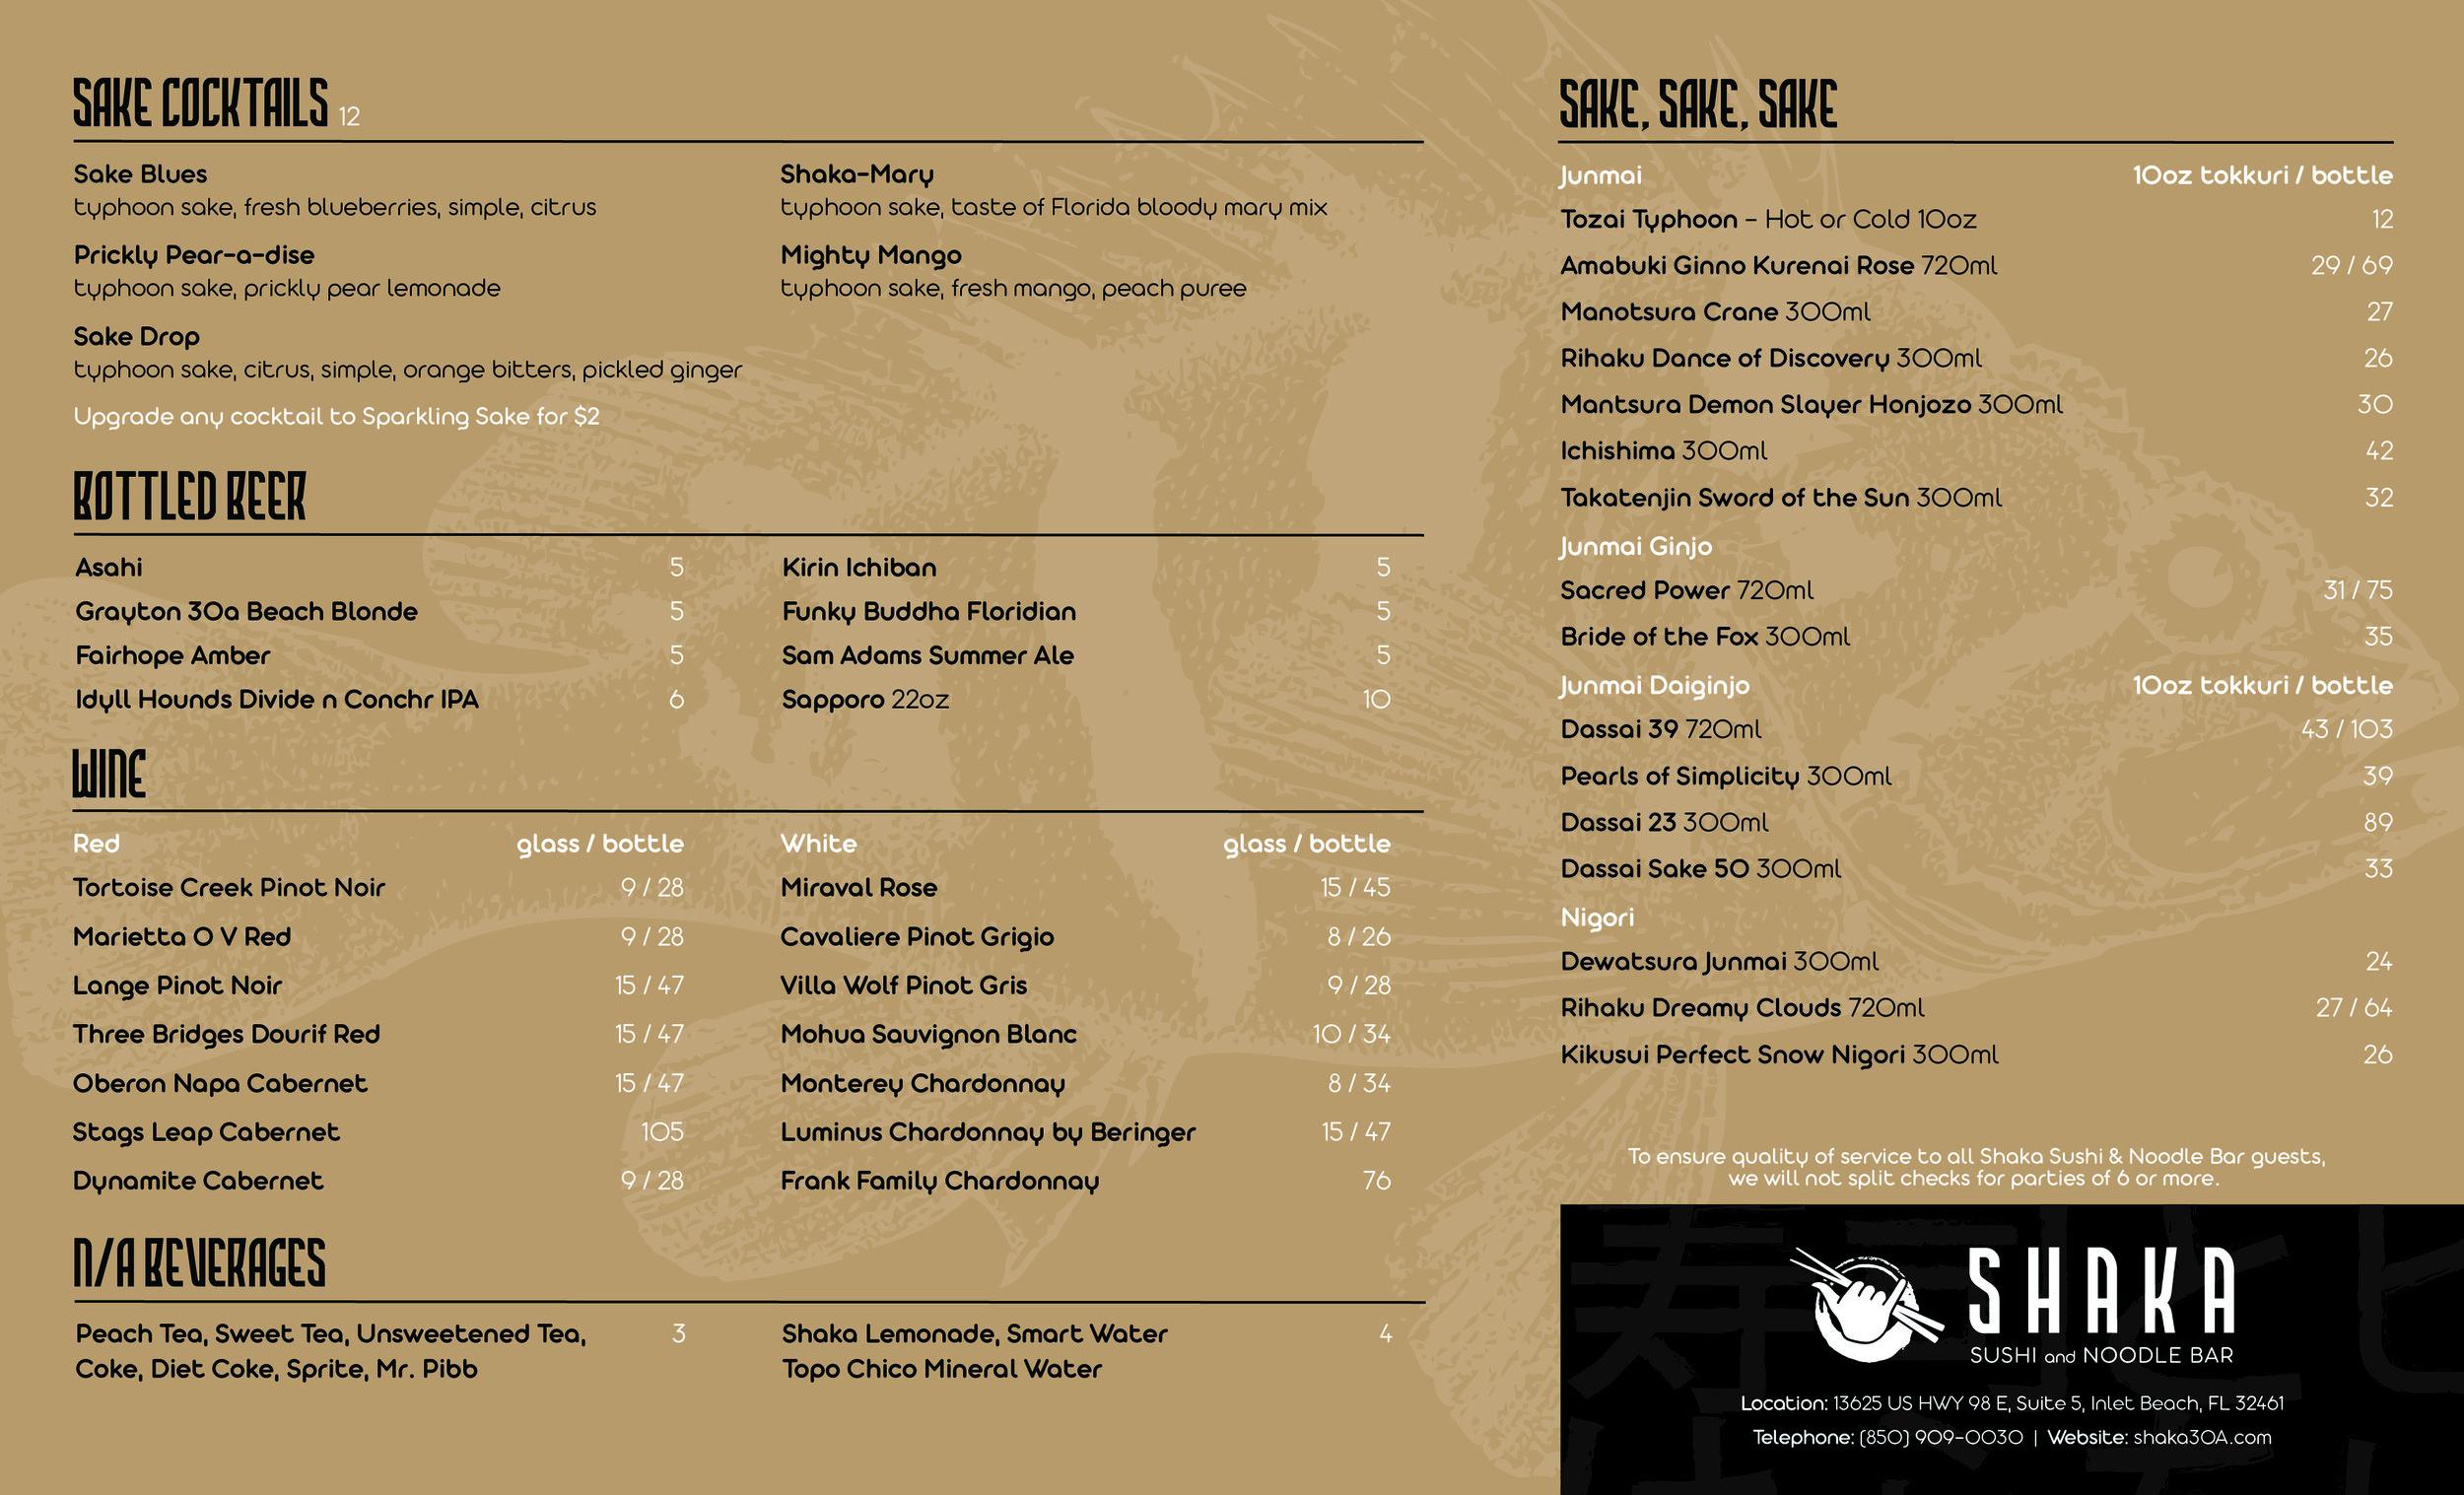 Shaka-Dinner_14x8.5_5.28.19-PRINT_shaka drinks.jpg